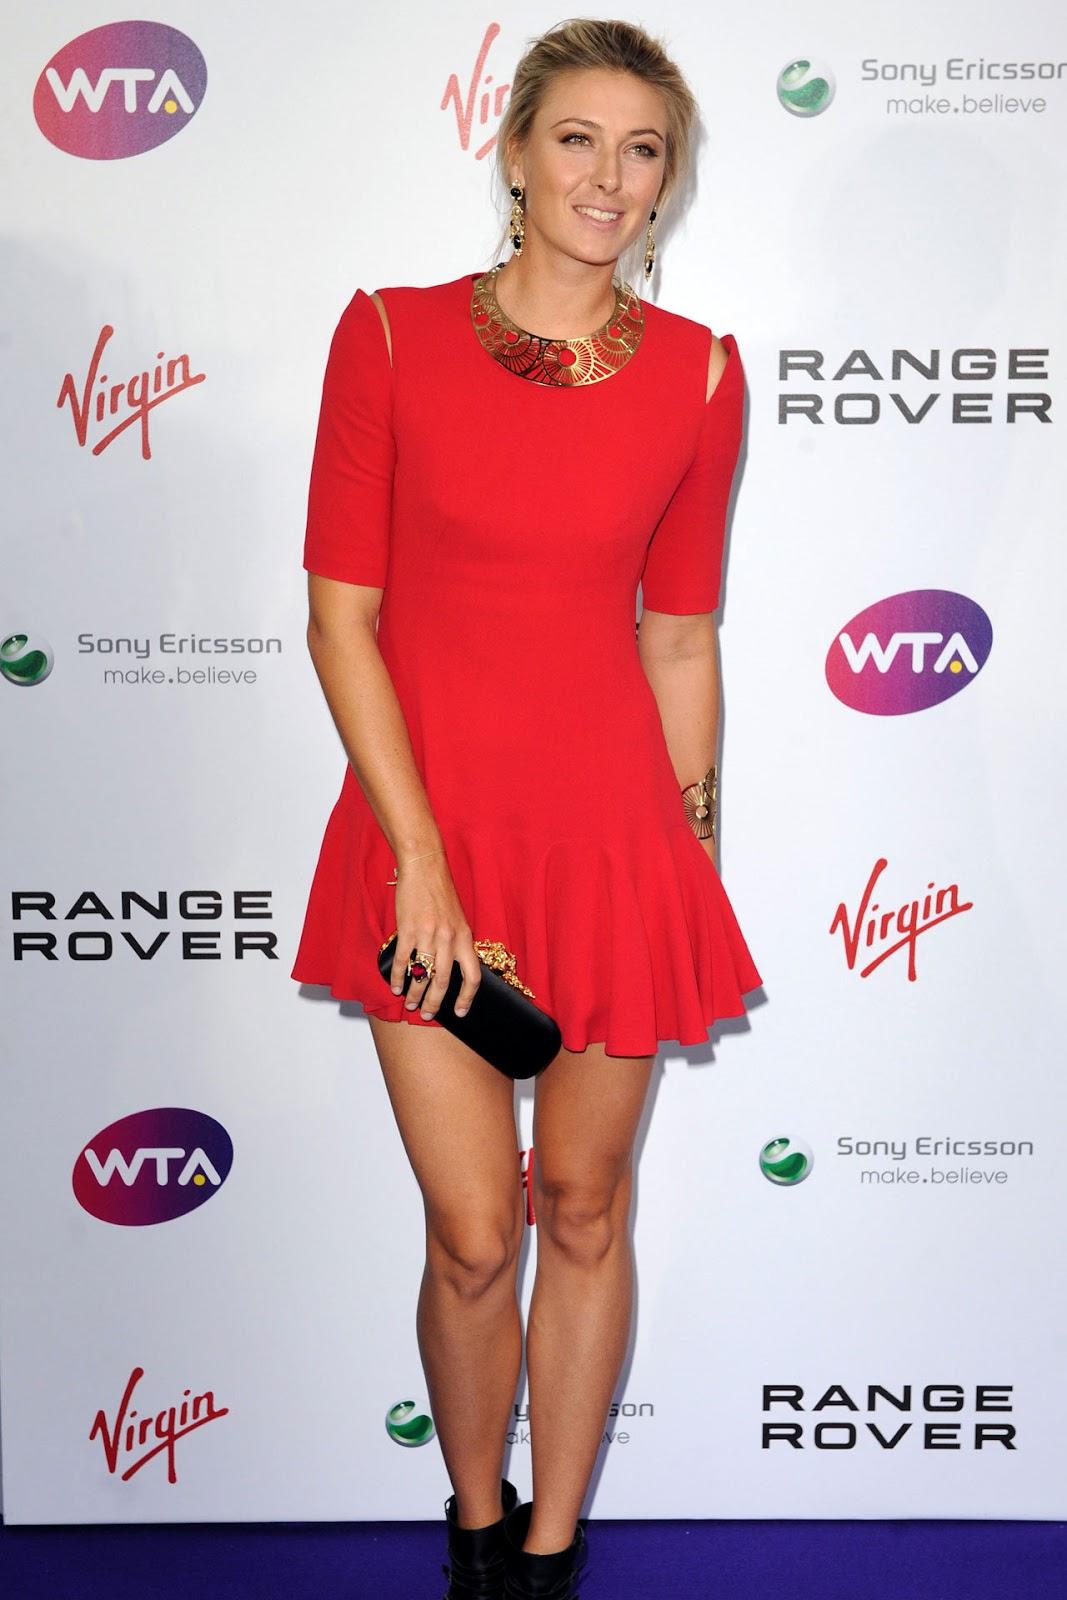 http://4.bp.blogspot.com/-QdK8n5B9YgI/TgQuxcqhN8I/AAAAAAAABFU/bXrqkR4ABxg/s1600/Maria-Sharapova-fashion-in-Alexander-McQueen.jpg